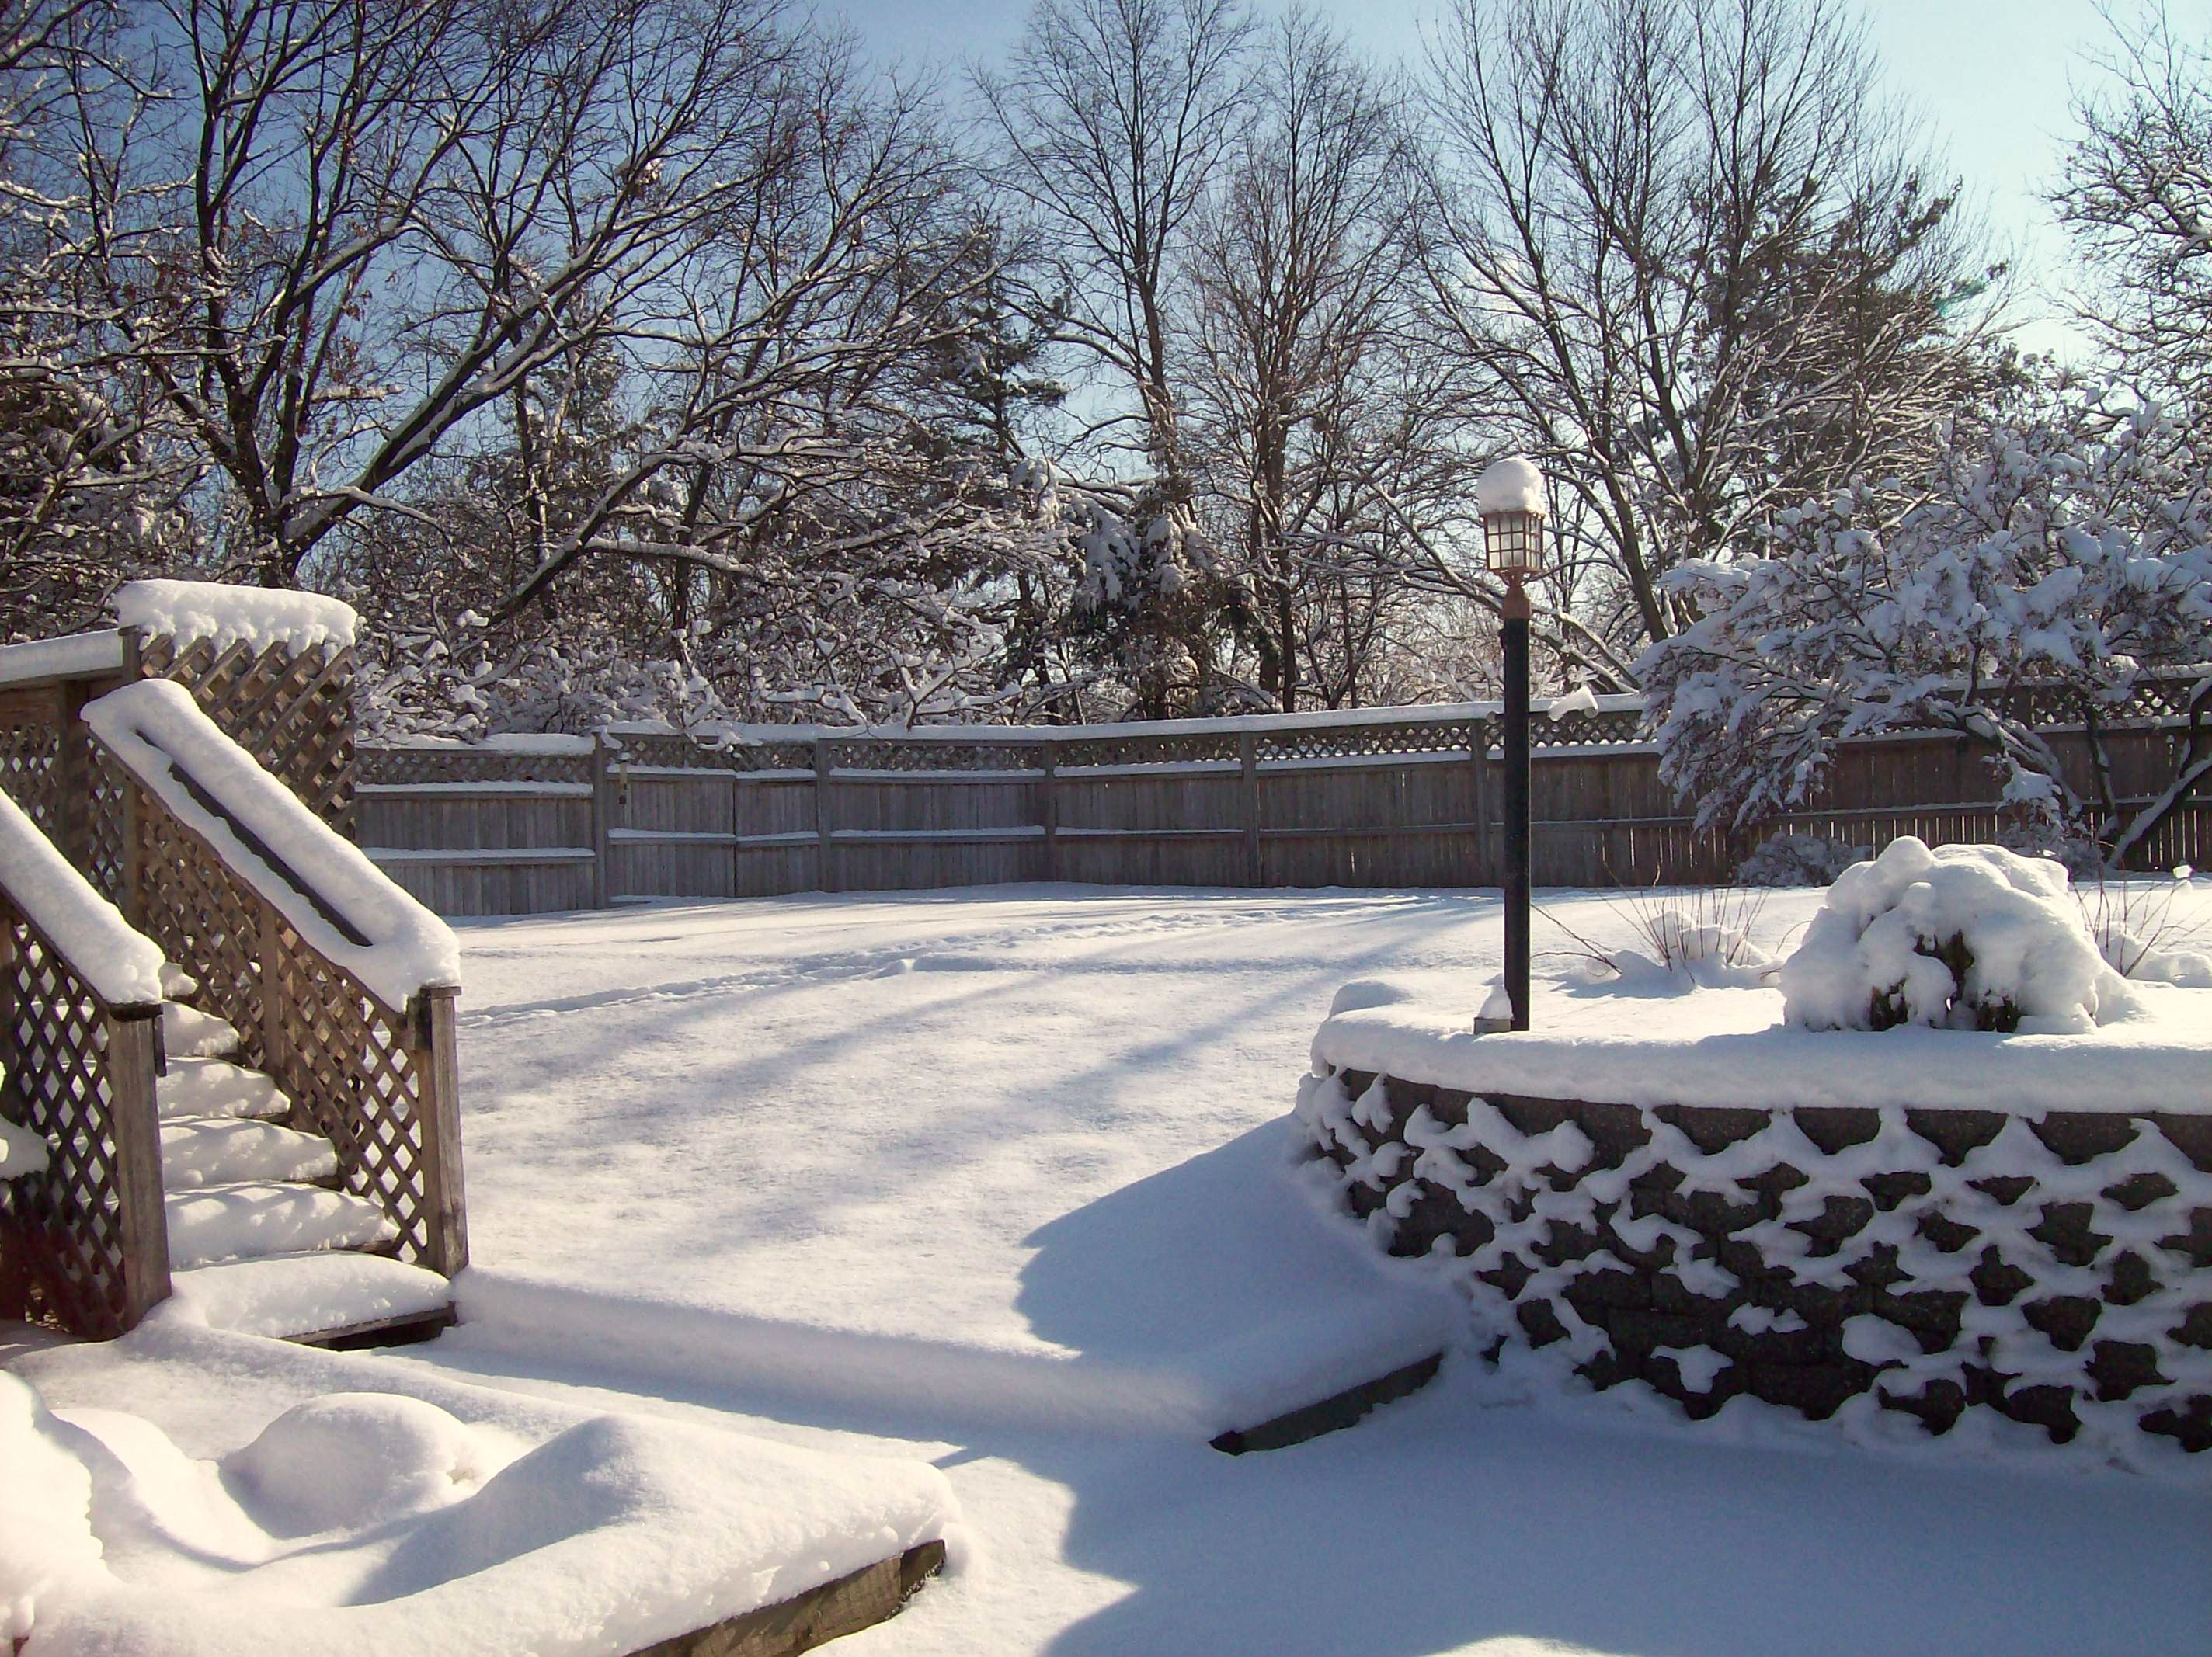 dollops of fresh snow; an emjayandthem photo